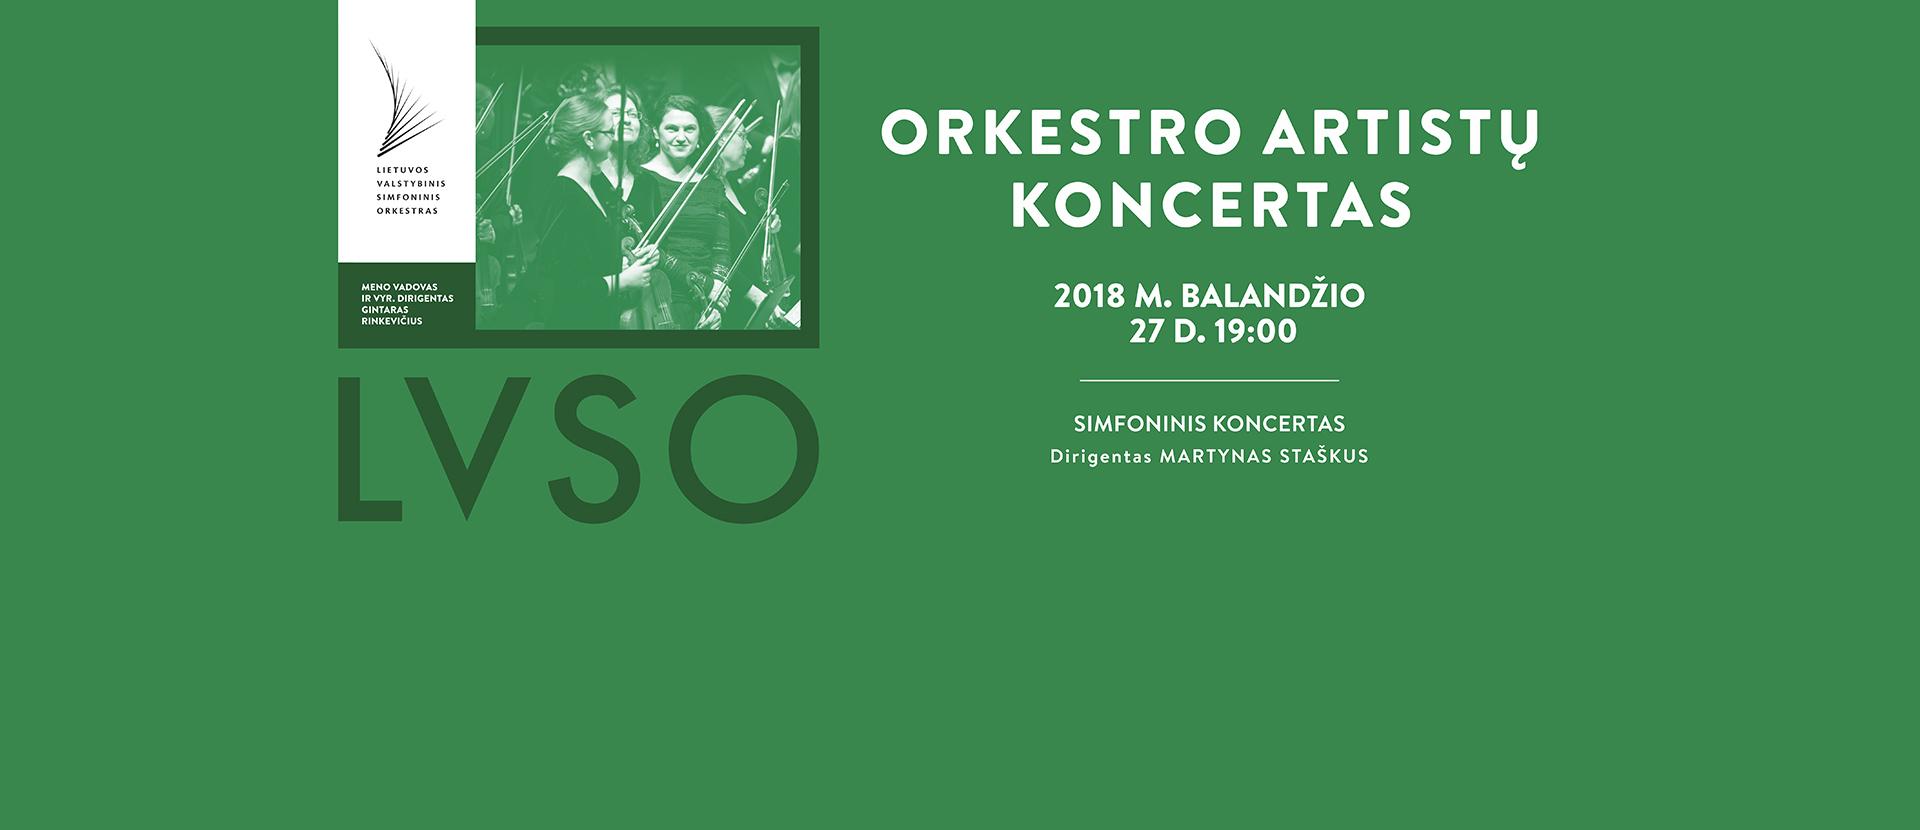 Simfoninis koncertas ORKESTRO ARTISTŲ KONCERTAS